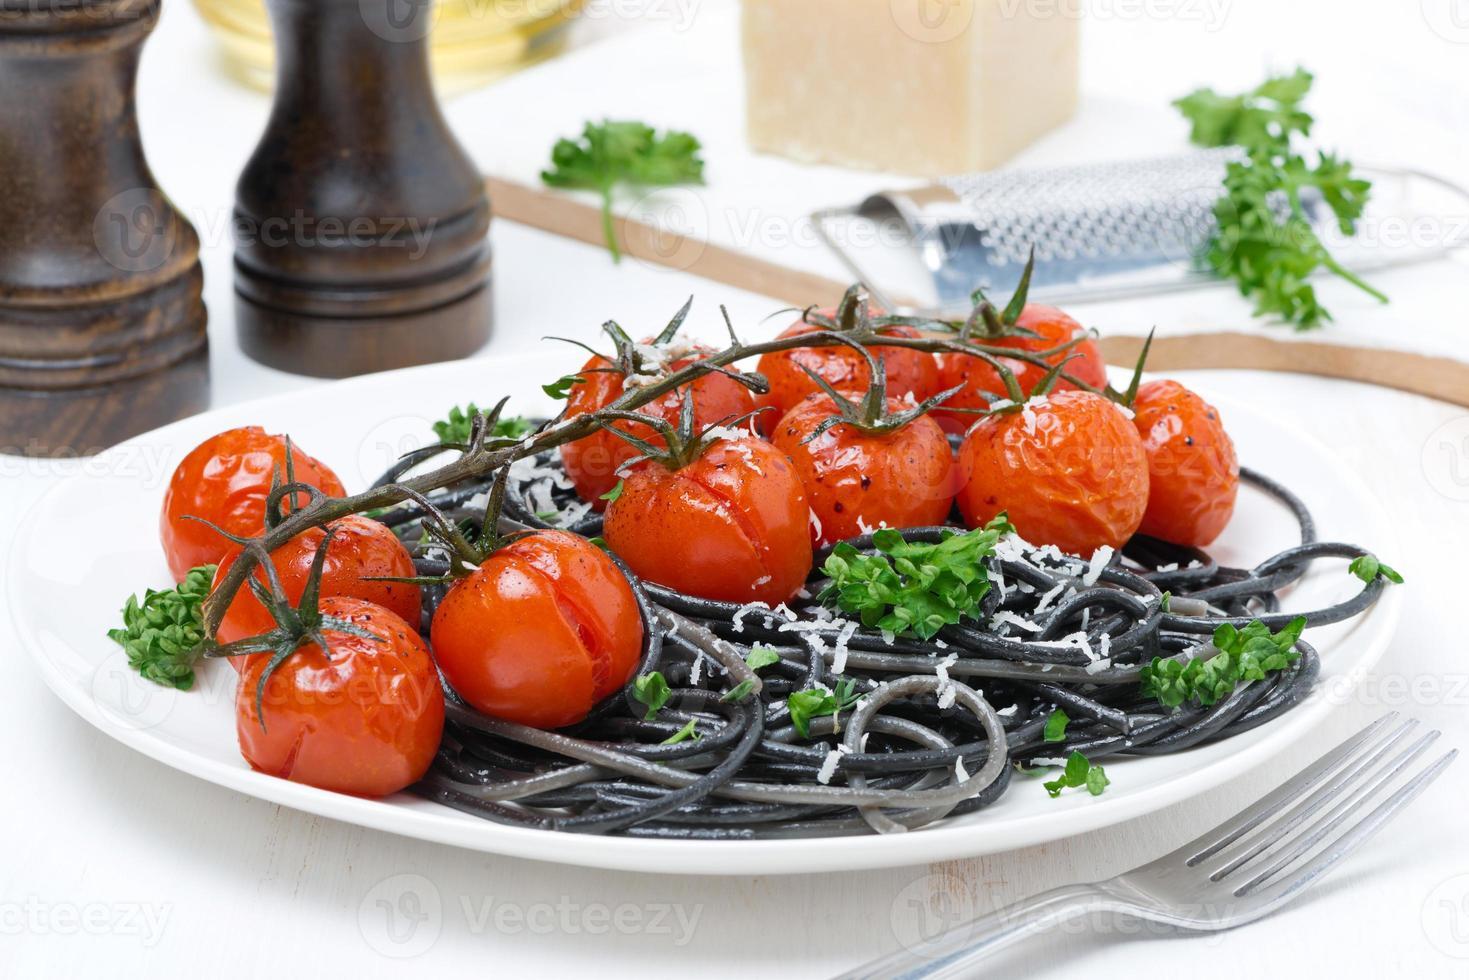 pasta negra con tomate al horno y perejil foto